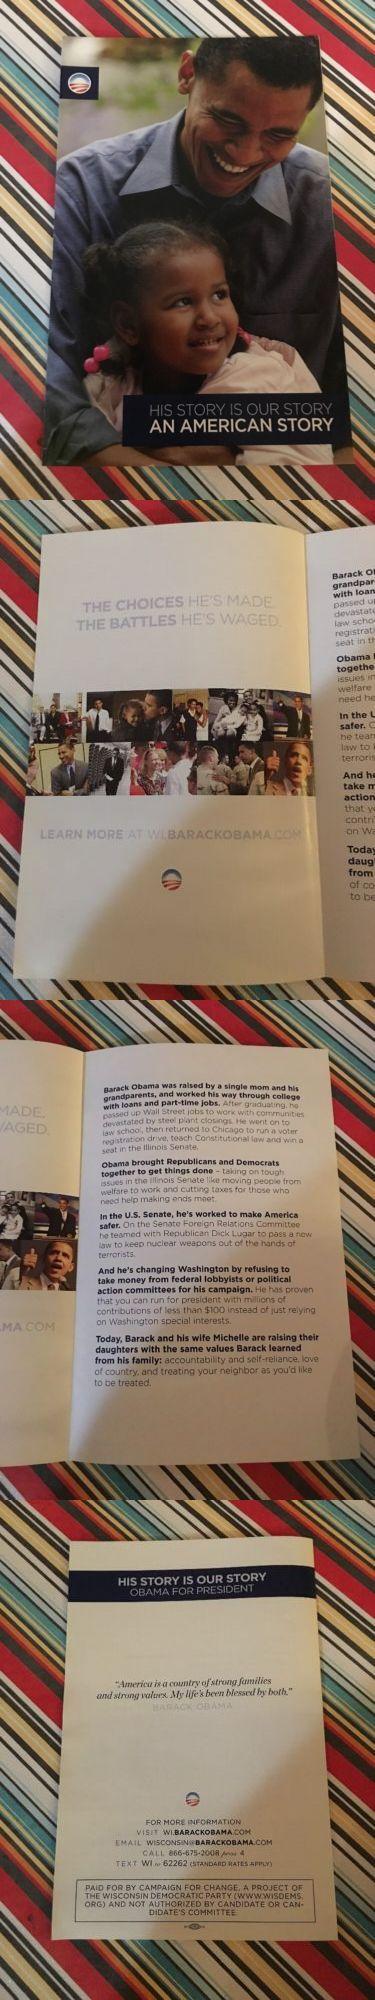 Barack Obama: Barack Obama 2008 Campaign For Change We Can Believe In Pamphlet Brochure -> BUY IT NOW ONLY: $4.5 on eBay!